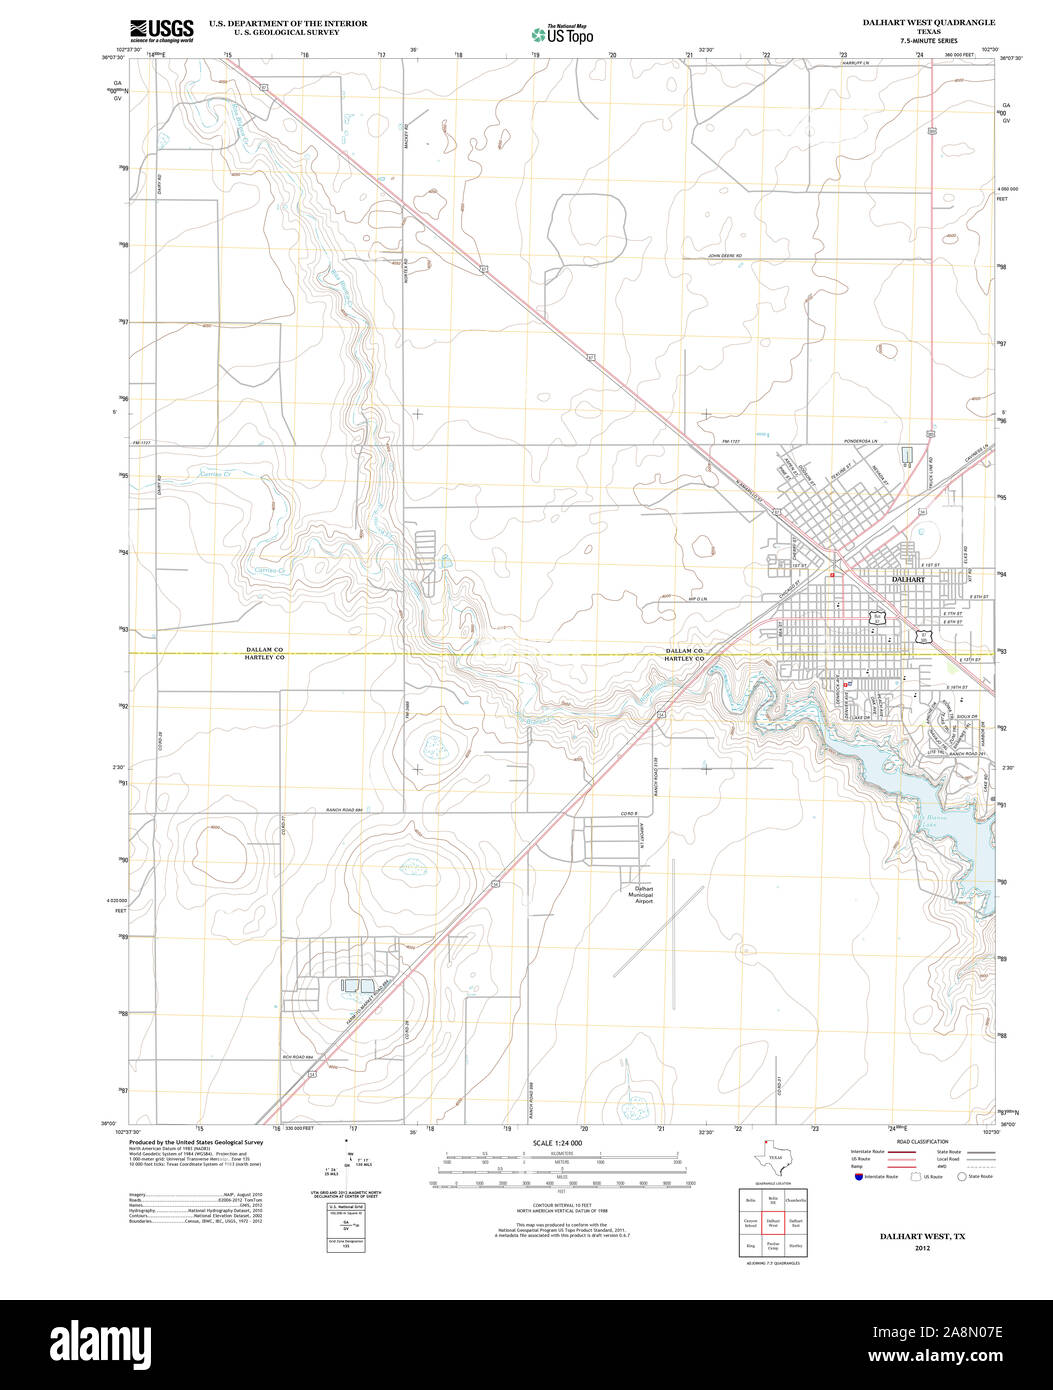 USGS TOPO Map Texas TX Dalhart West 20121108 TM Restoration ... Dalhart Texas Map on greater houston texas map, hartley texas map, chapman ranch texas map, bloomburg texas map, tulia texas map, claude texas map, waxahachie texas map, texline texas map, lockney texas map, nocona hills texas map, deanville texas map, lueders texas map, bovina texas map, devers texas map, decordova texas map, decatur texas map, estelline texas map, faith texas map, sidney texas map, lubbock texas map,